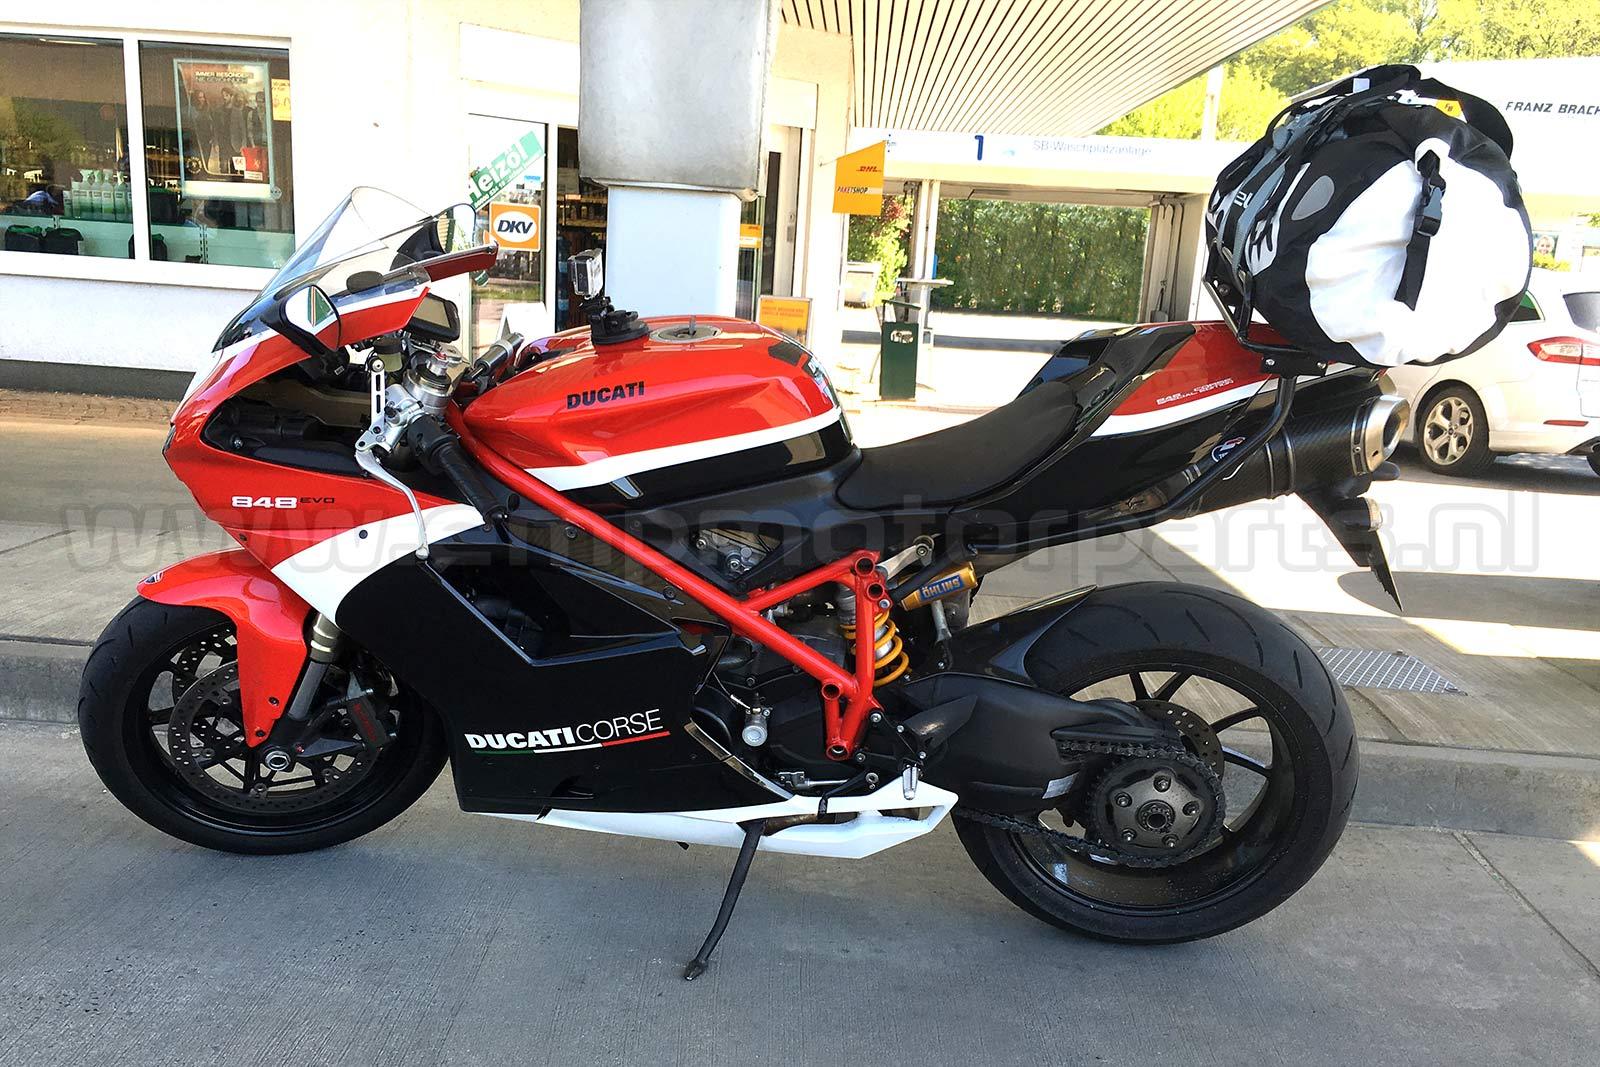 Gepäckbrücke Ducati Ducati (4)